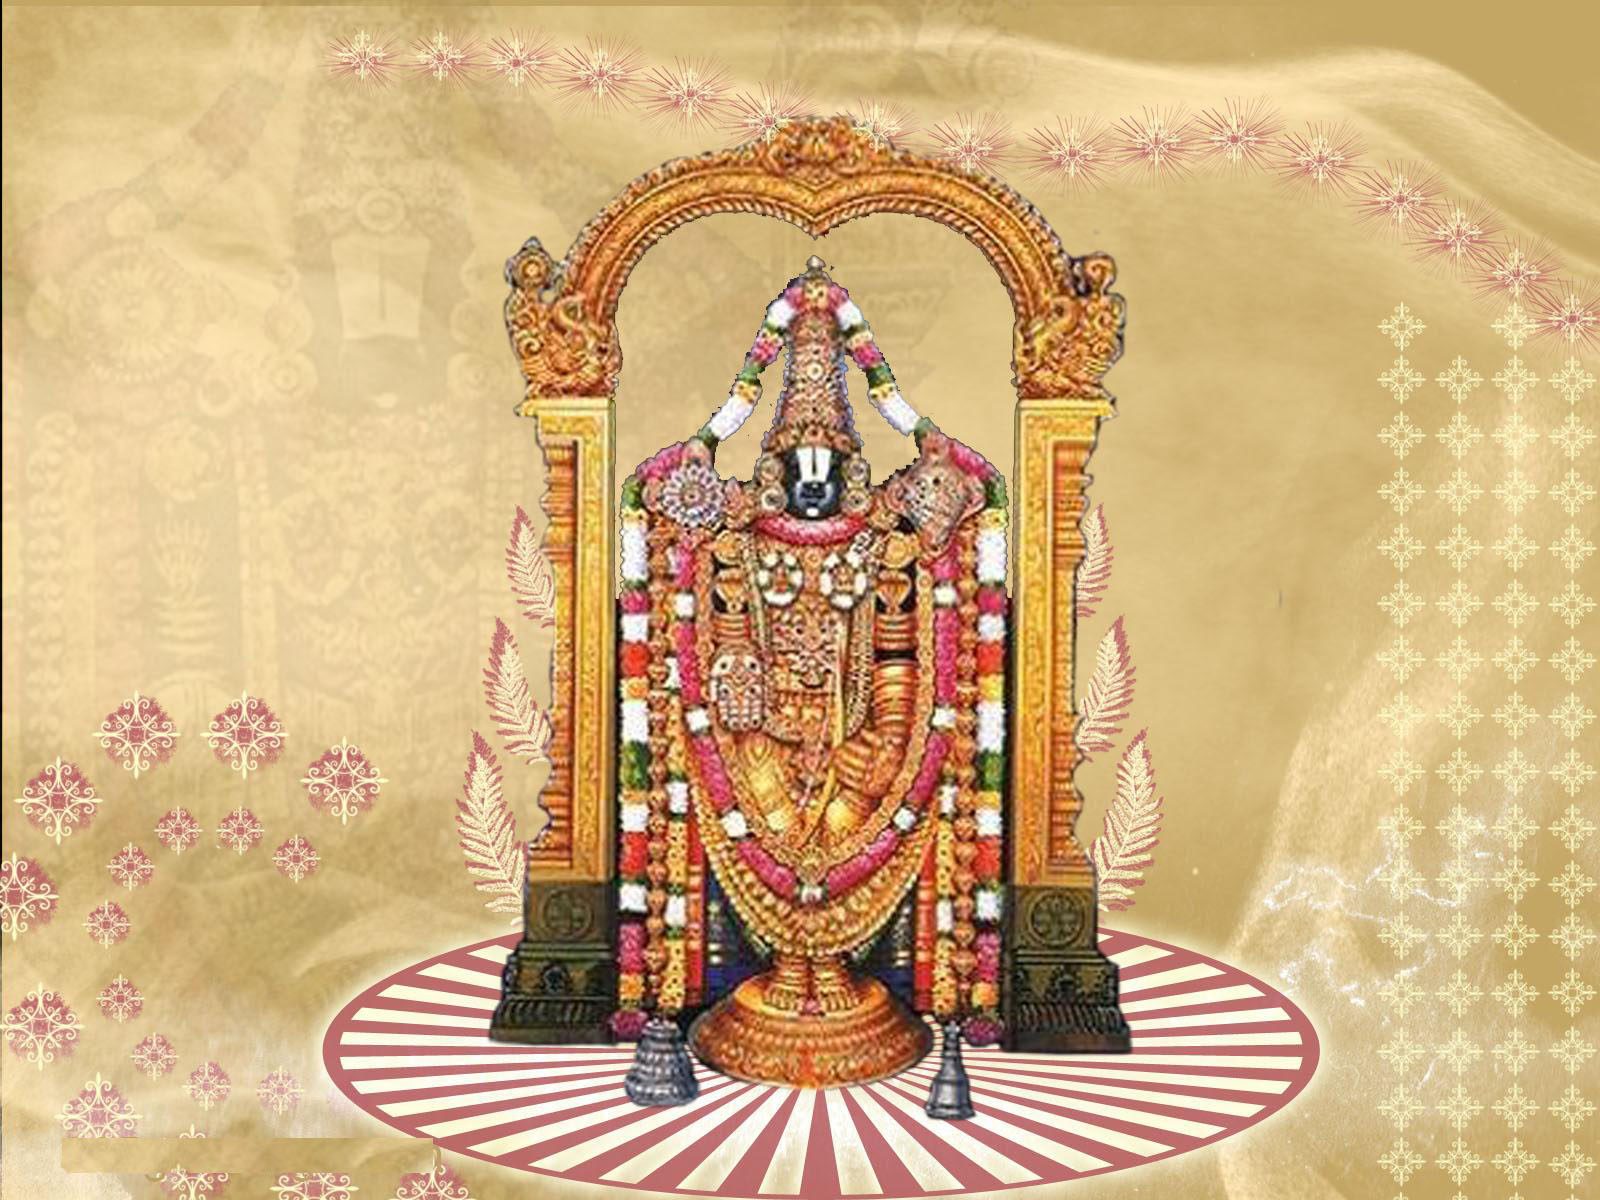 Great Wallpaper Lord Govinda - Lord%2BBalaji%2Bimages%2B%252823%2529  Pictures_904973.jpg